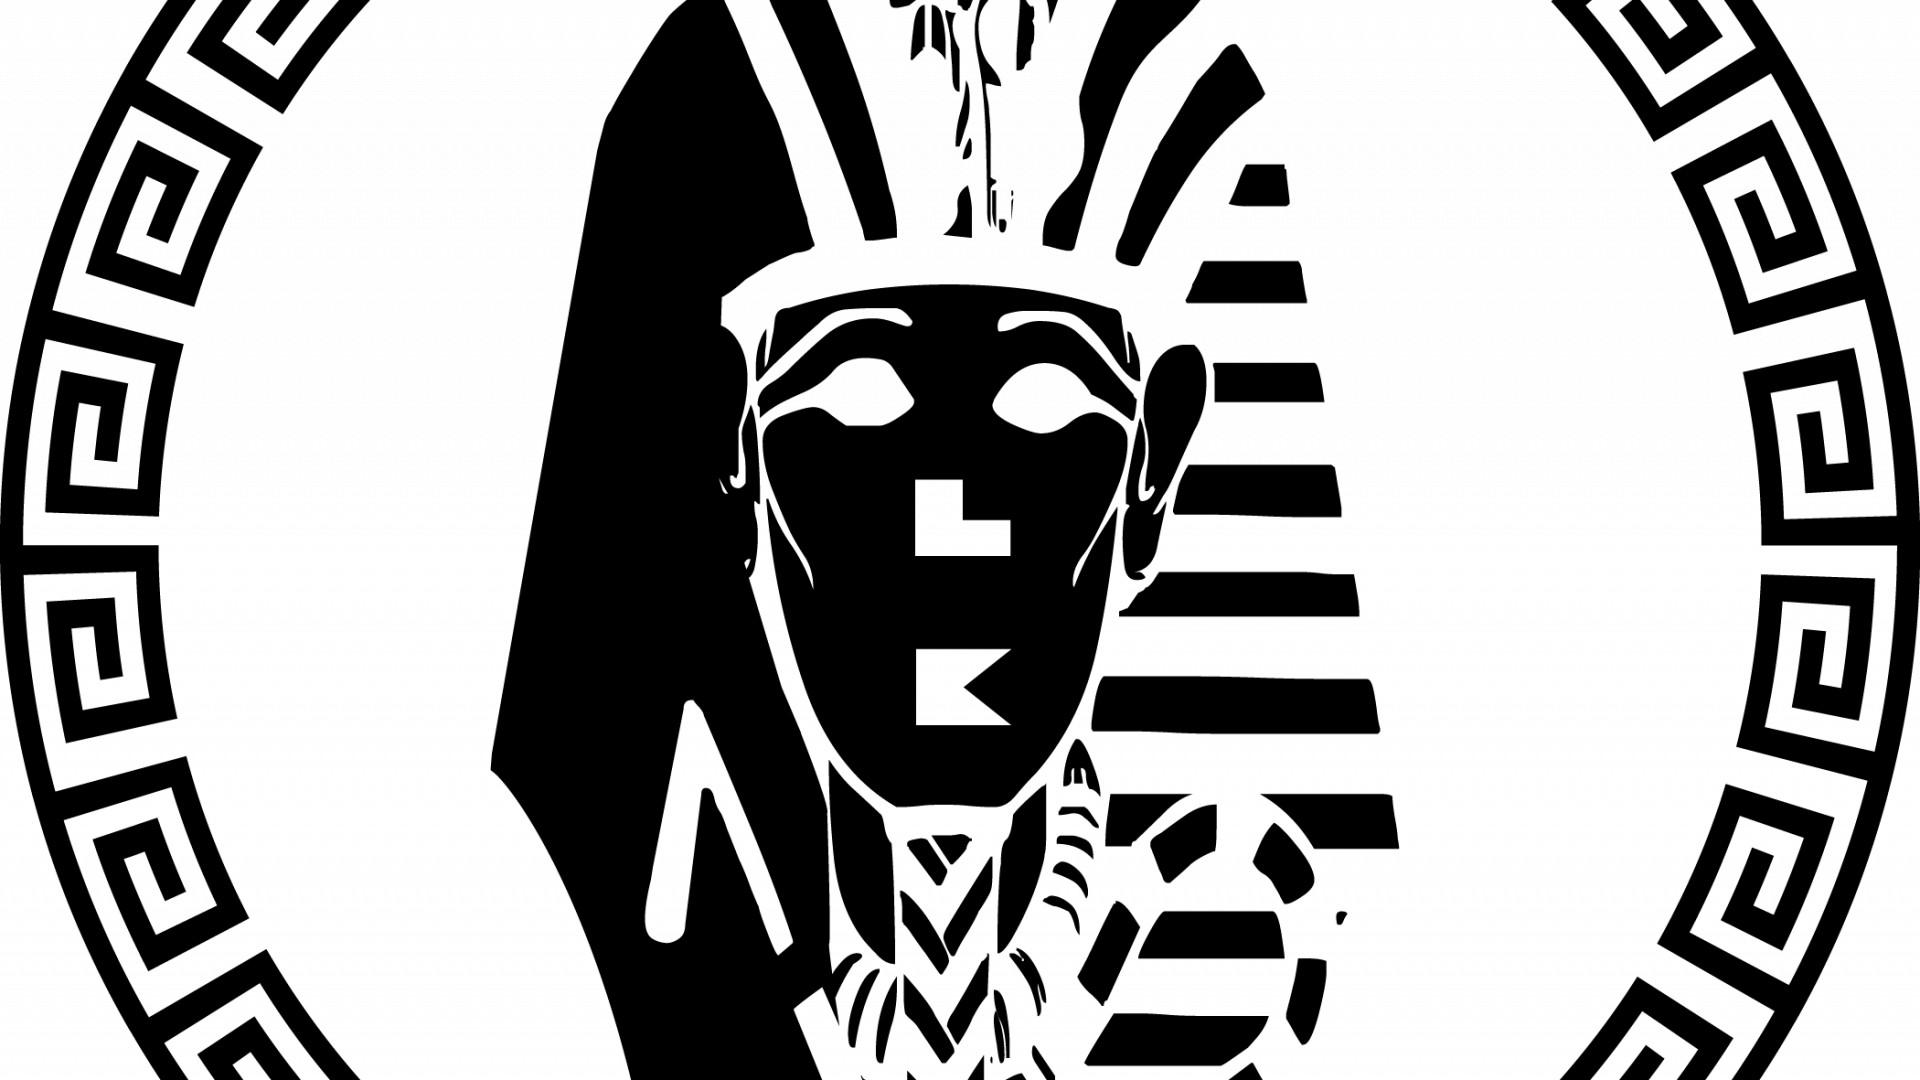 Tyga Last Kings Wallpaper Hd 53 Pictures